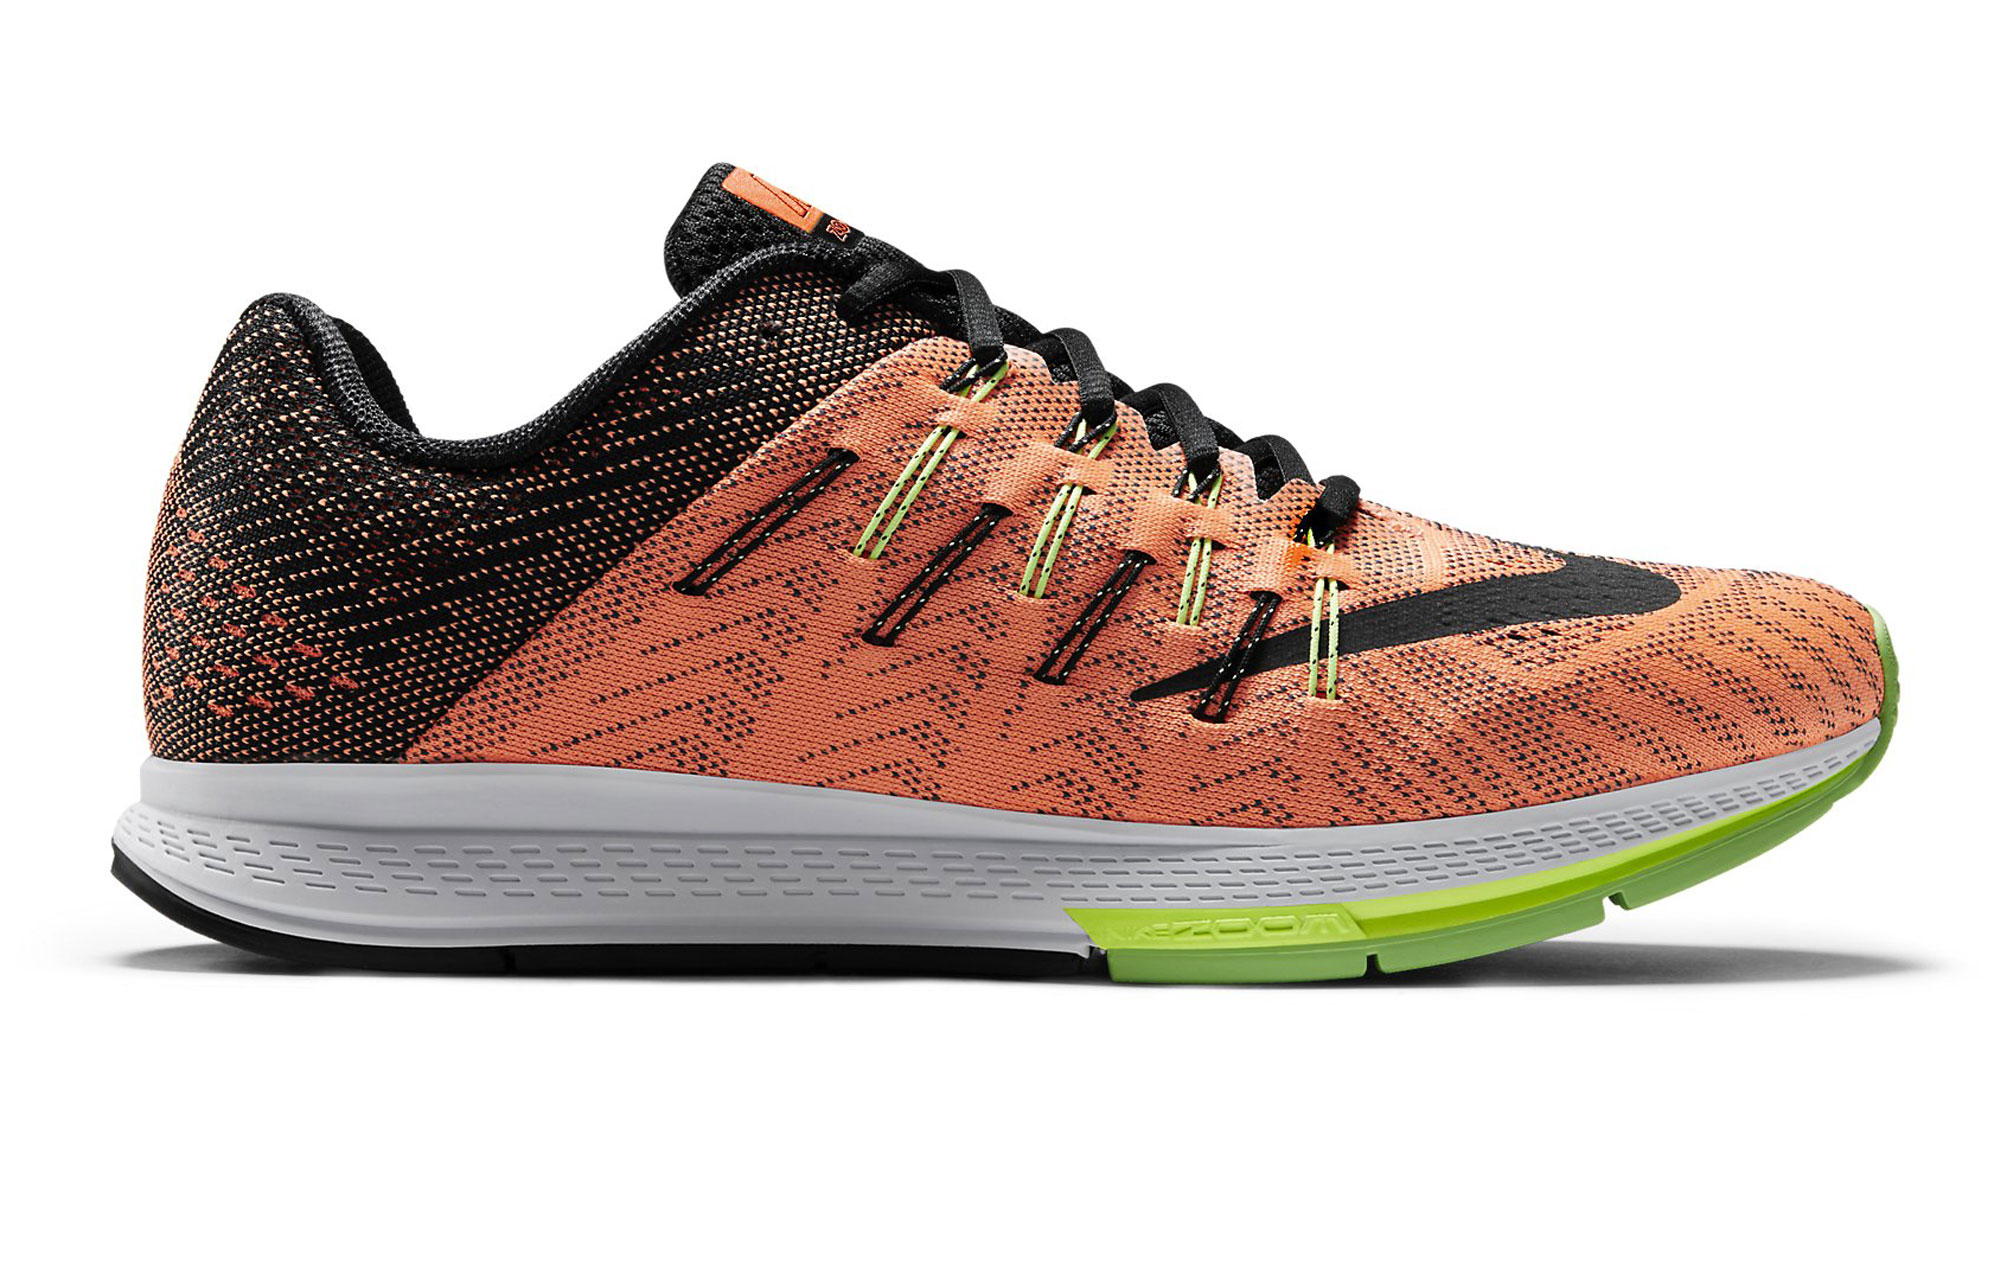 finest selection cd591 8b886 Zapatillas Nike AIR ZOOM ELITE 8 para Hombre Naranja